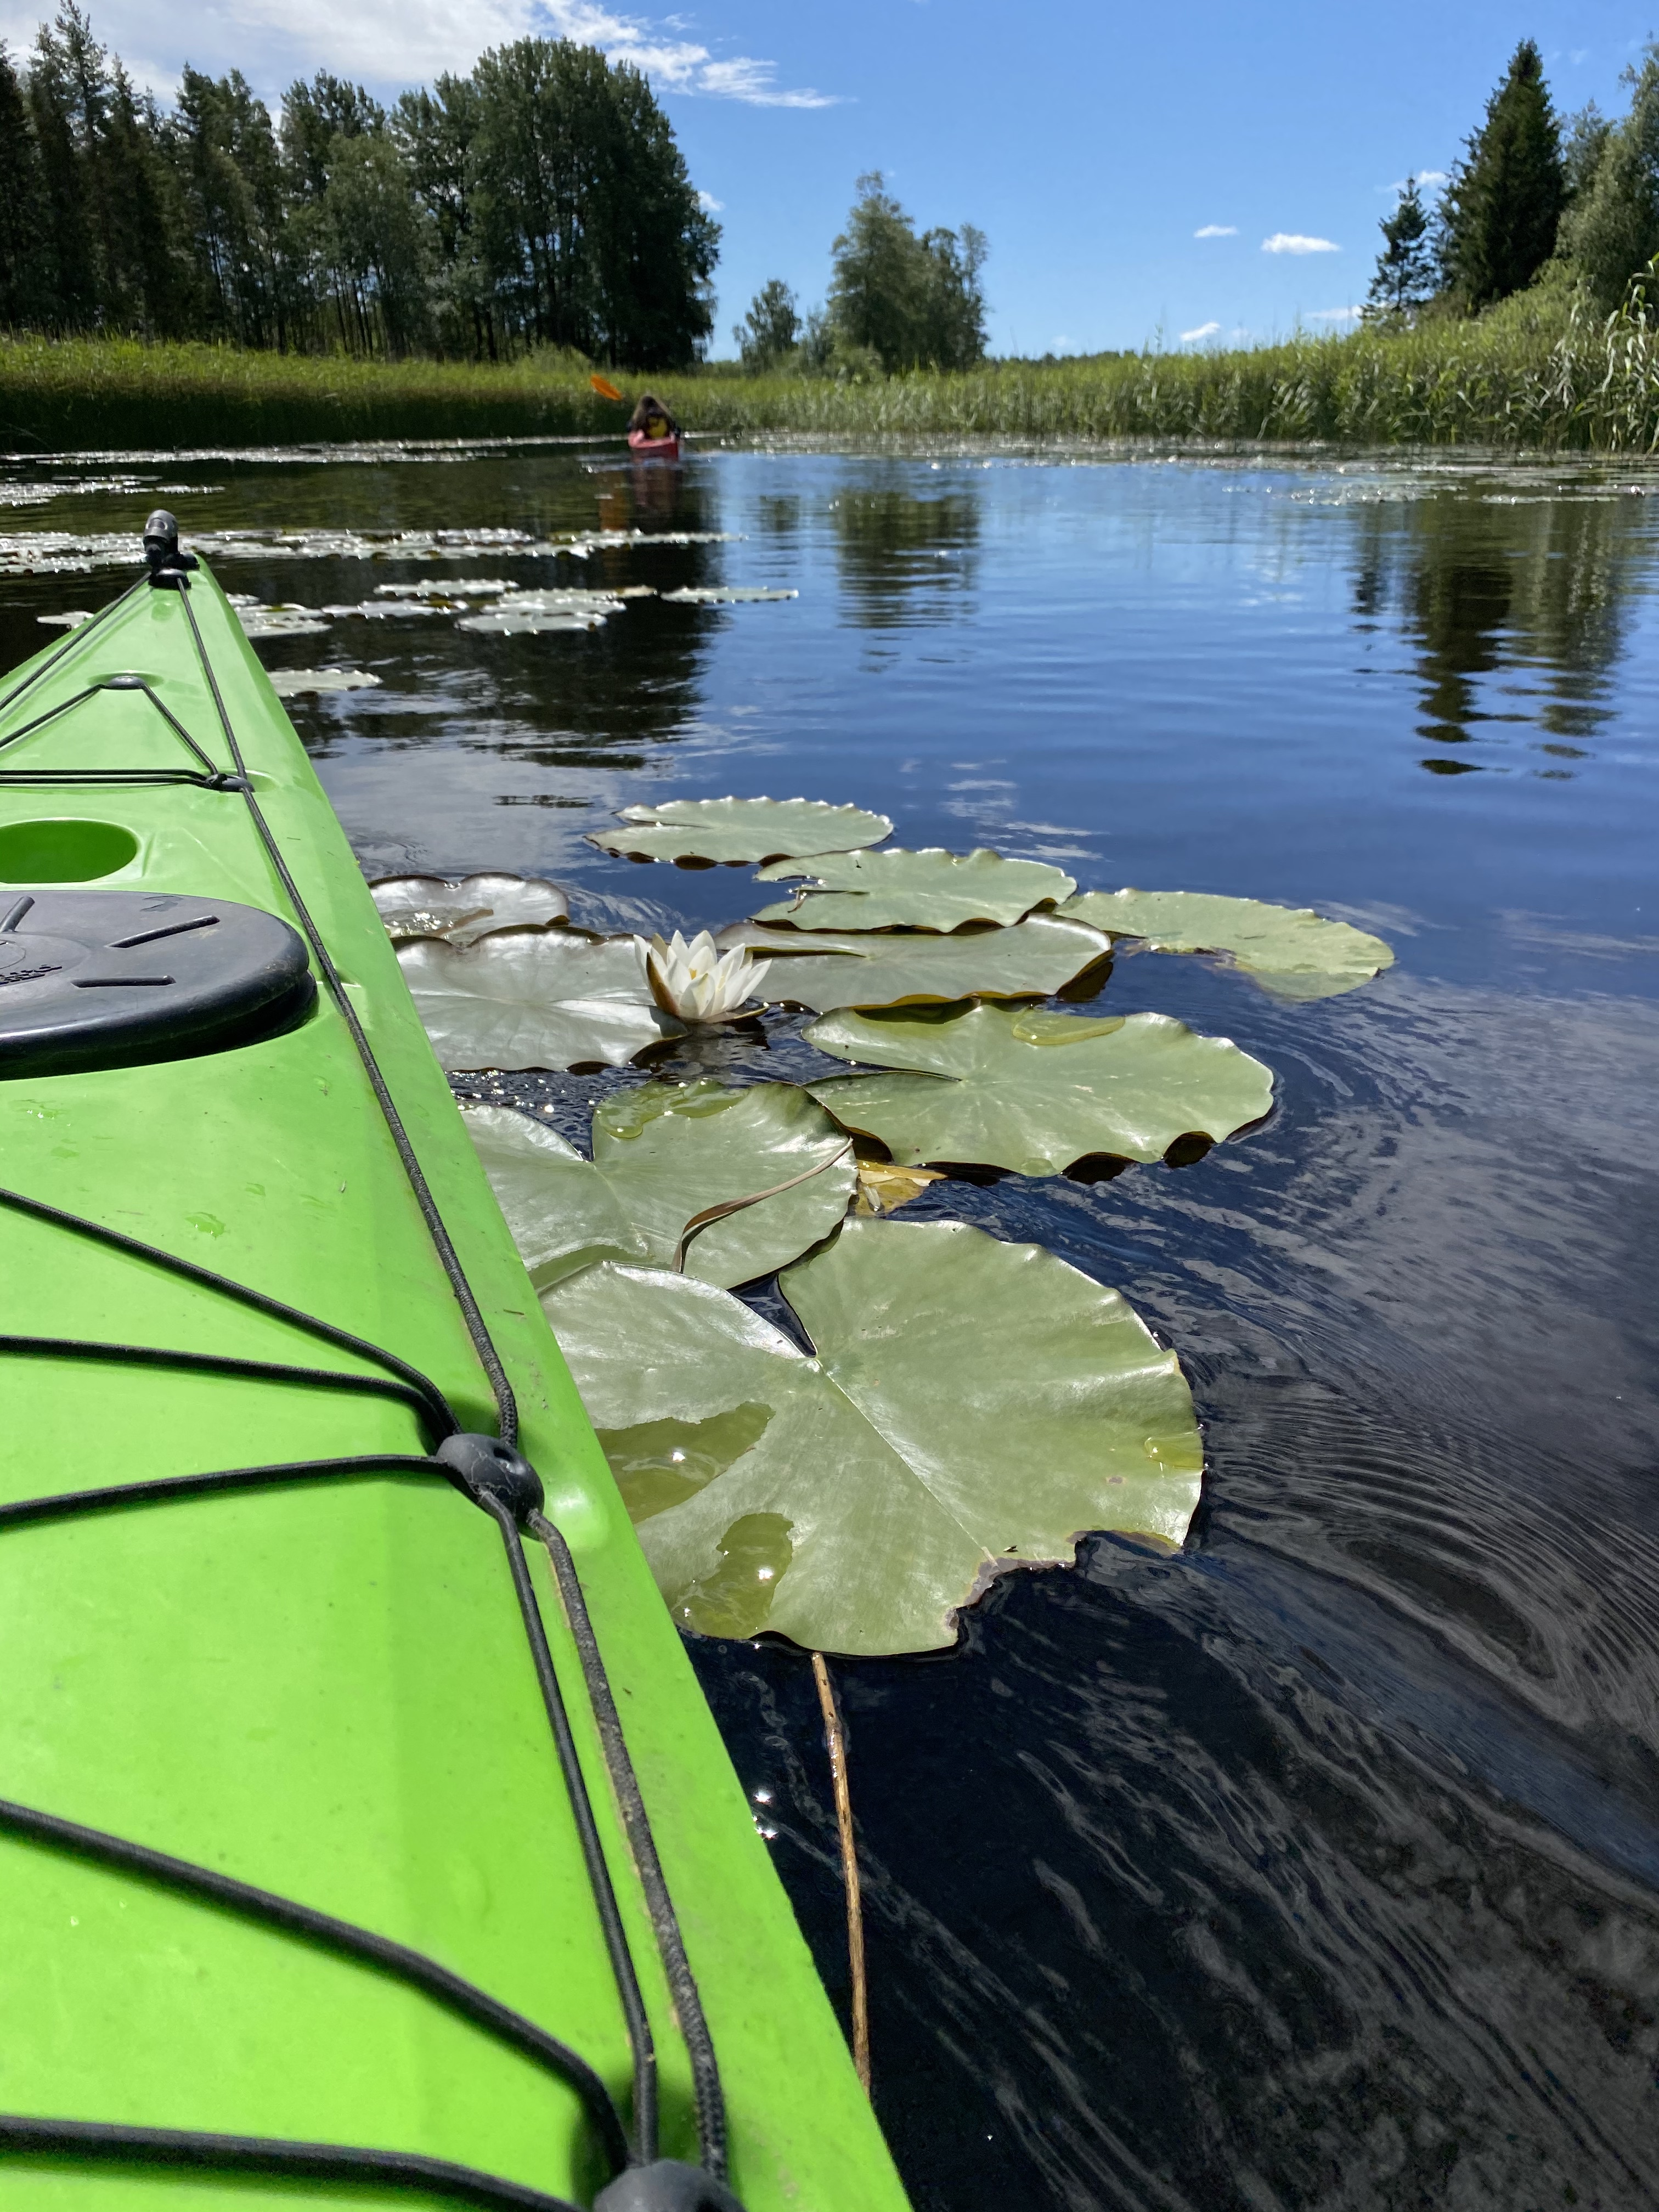 Kajakk på Vansjø- Vestre Kjærnes gård